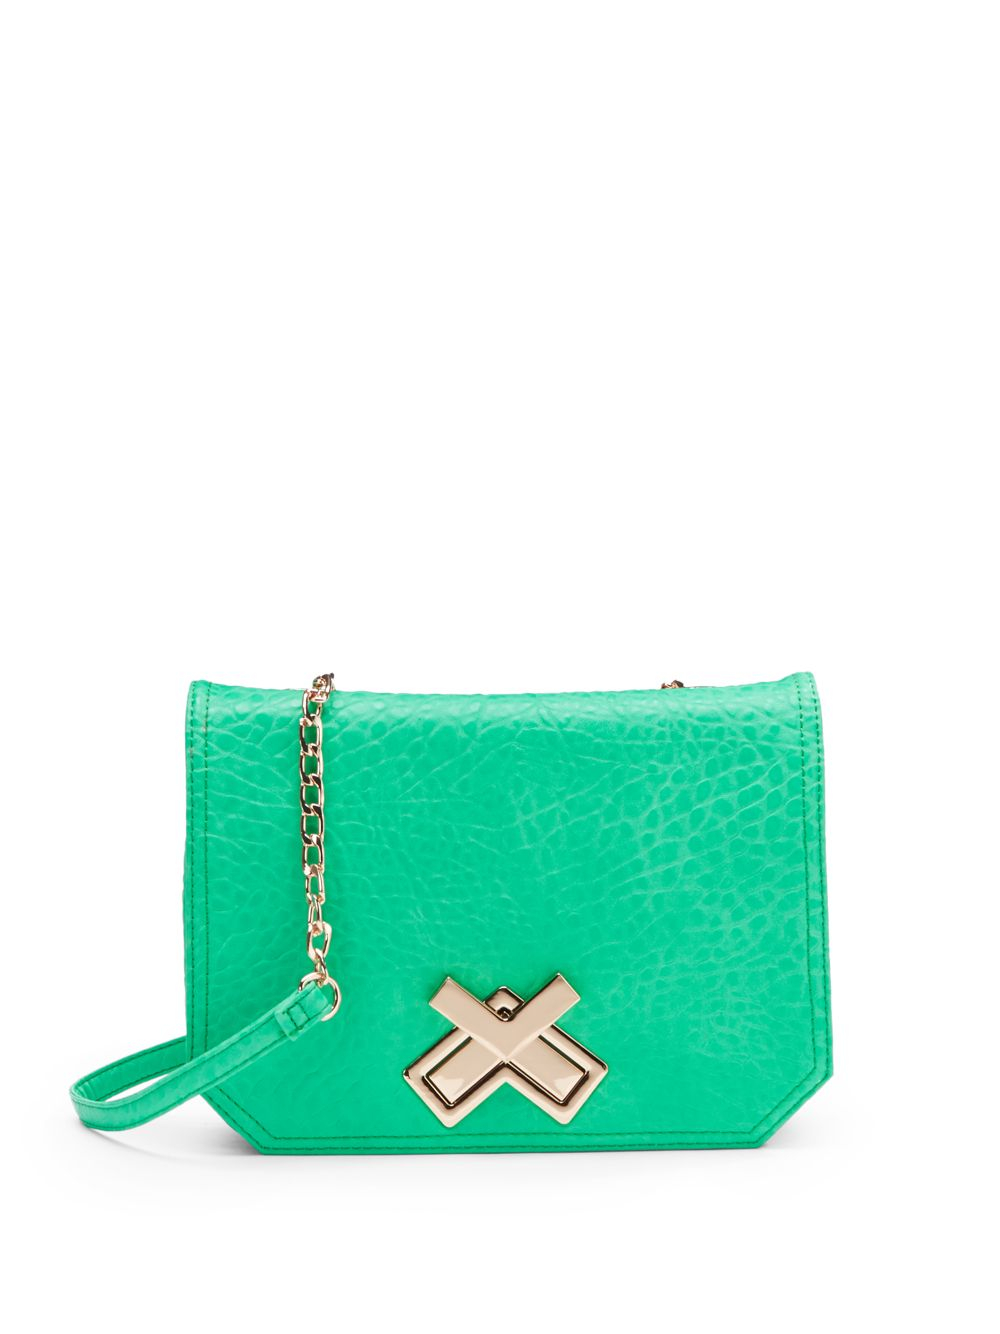 deux cross leather crossbody bag in green mint